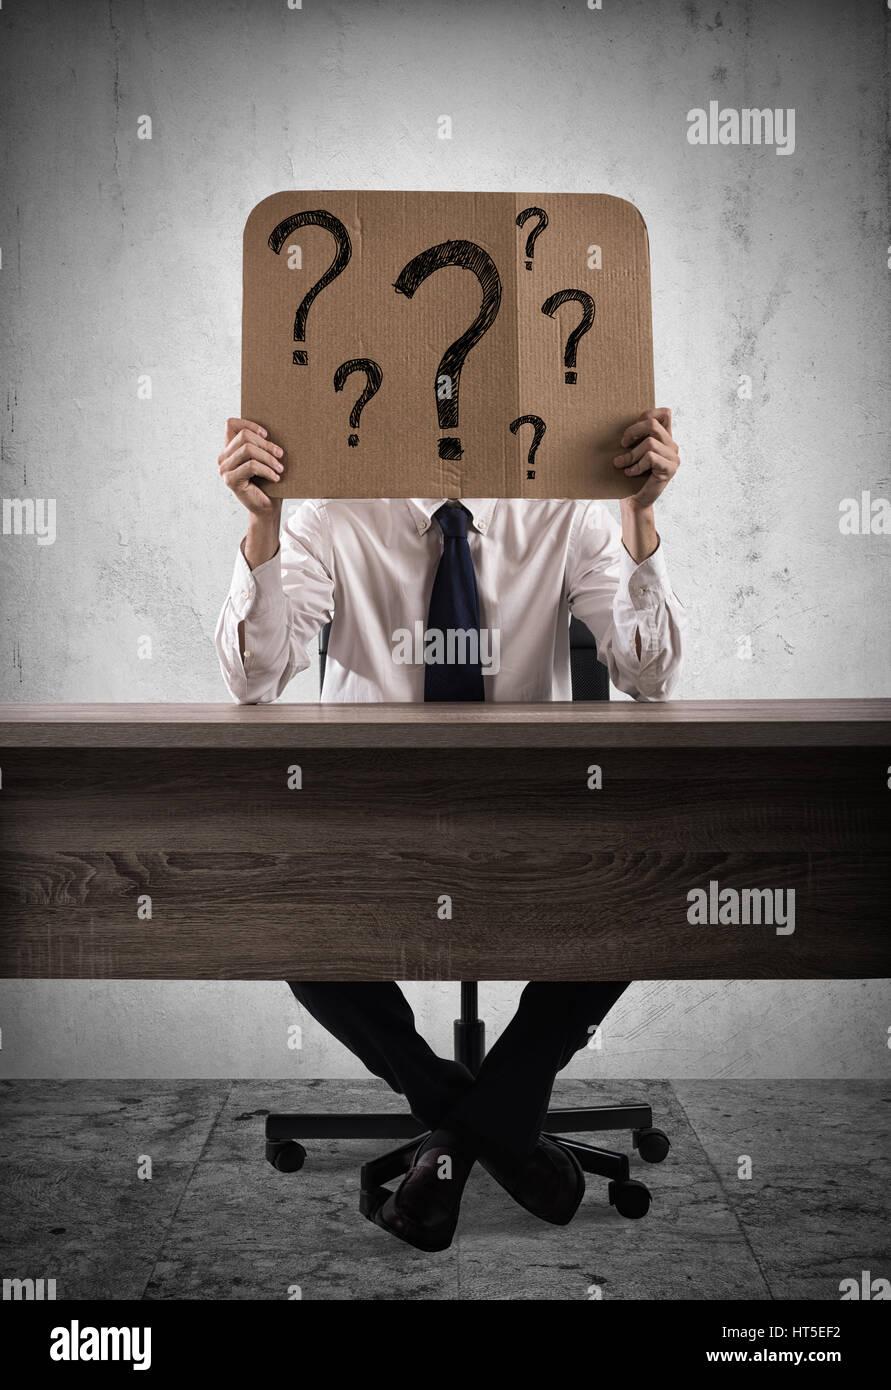 Interrogative businessman - Stock Image